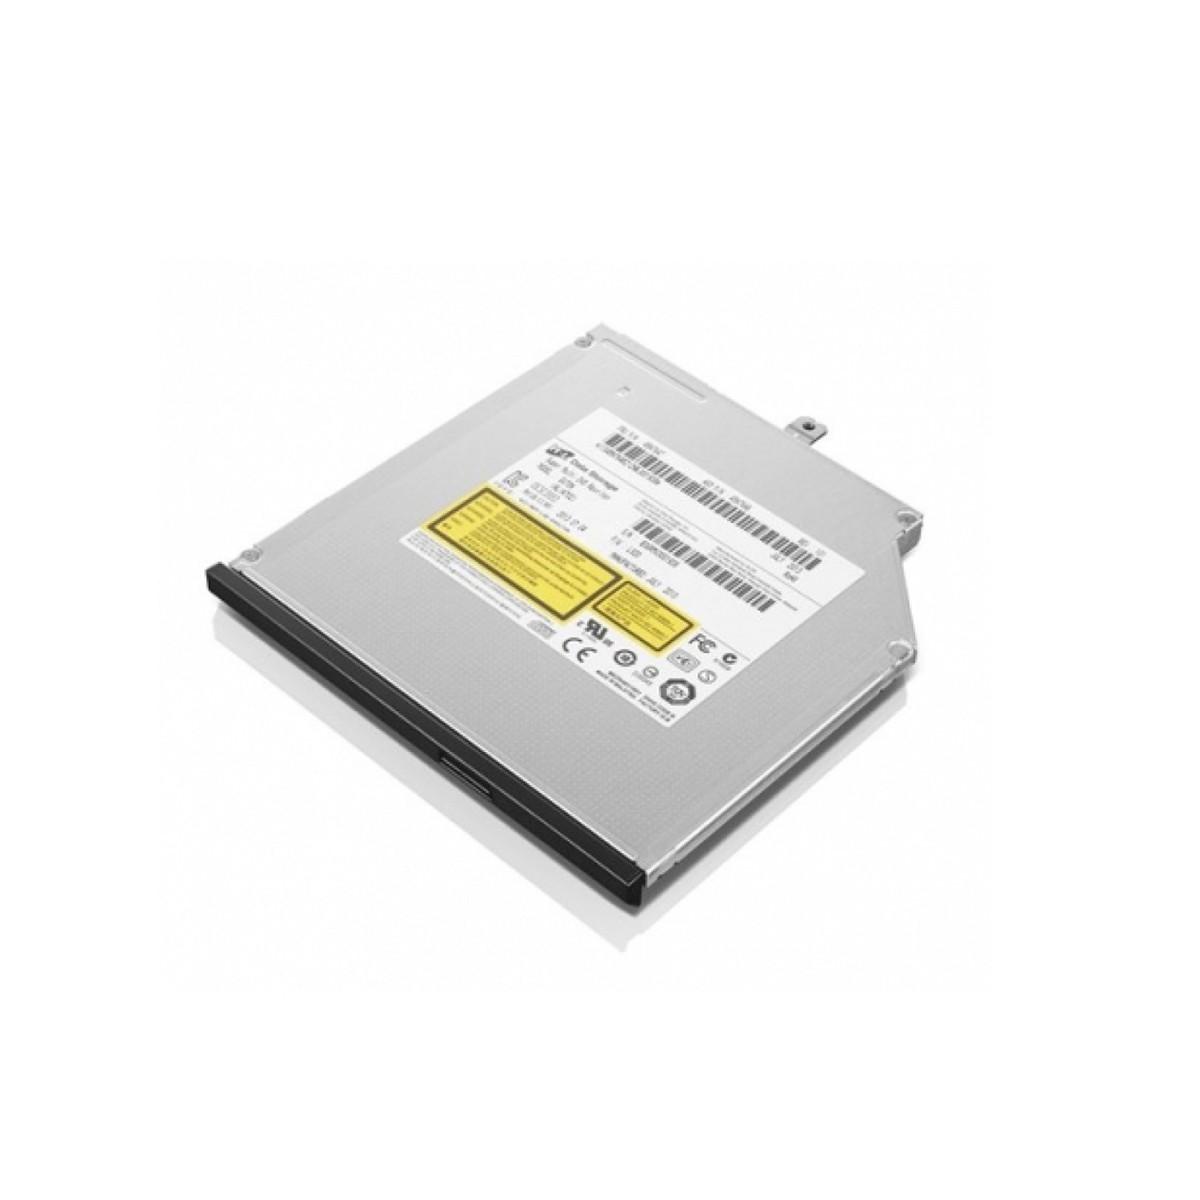 LENOVO® ThinkPad® Ultrabay™ DVD Slim Burner III Demoartikel